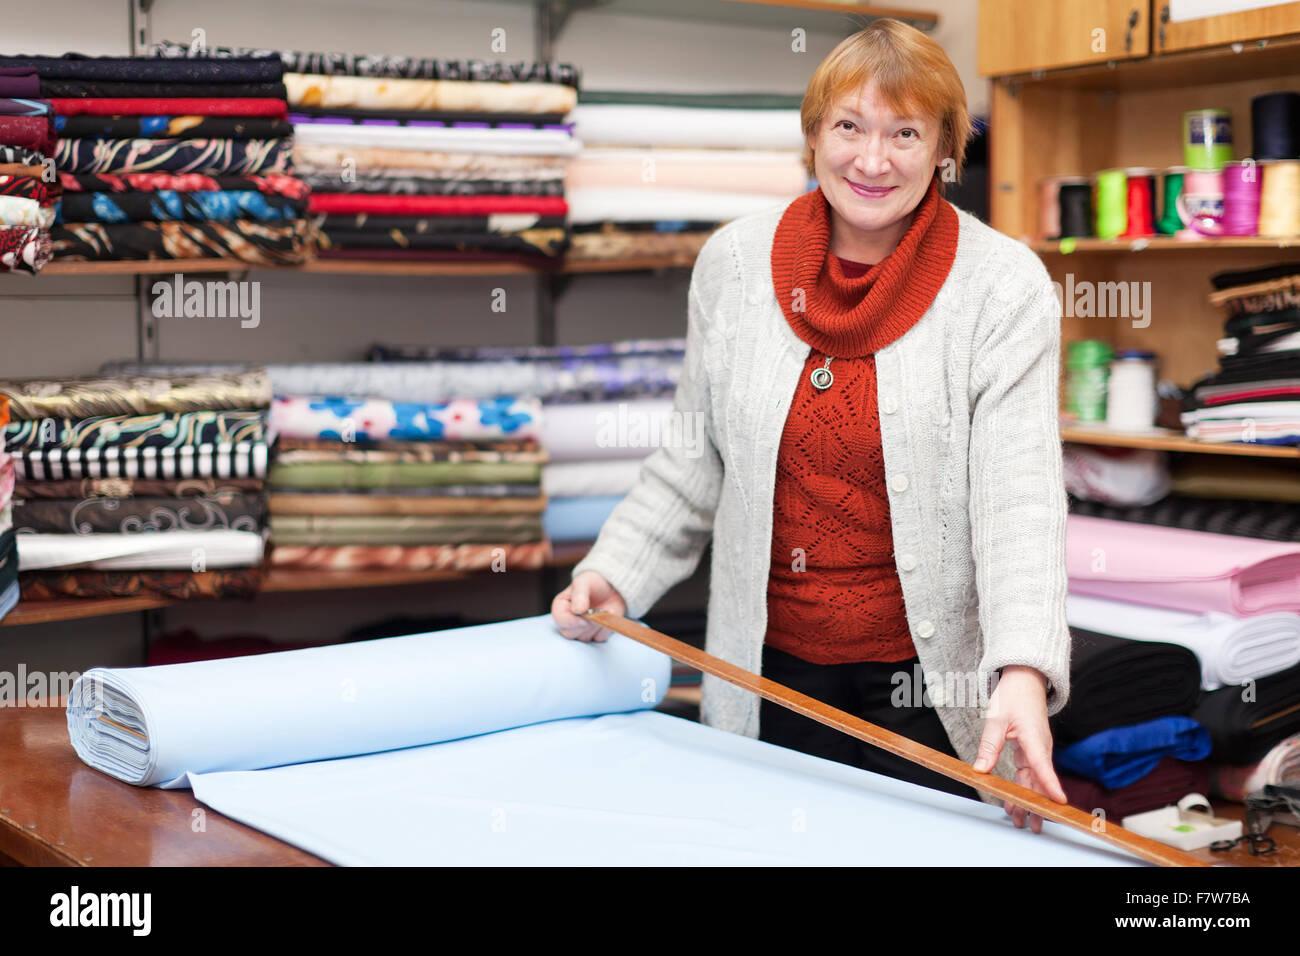 sclerk works in the tissue store stock photo royalty sclerk works in the tissue store